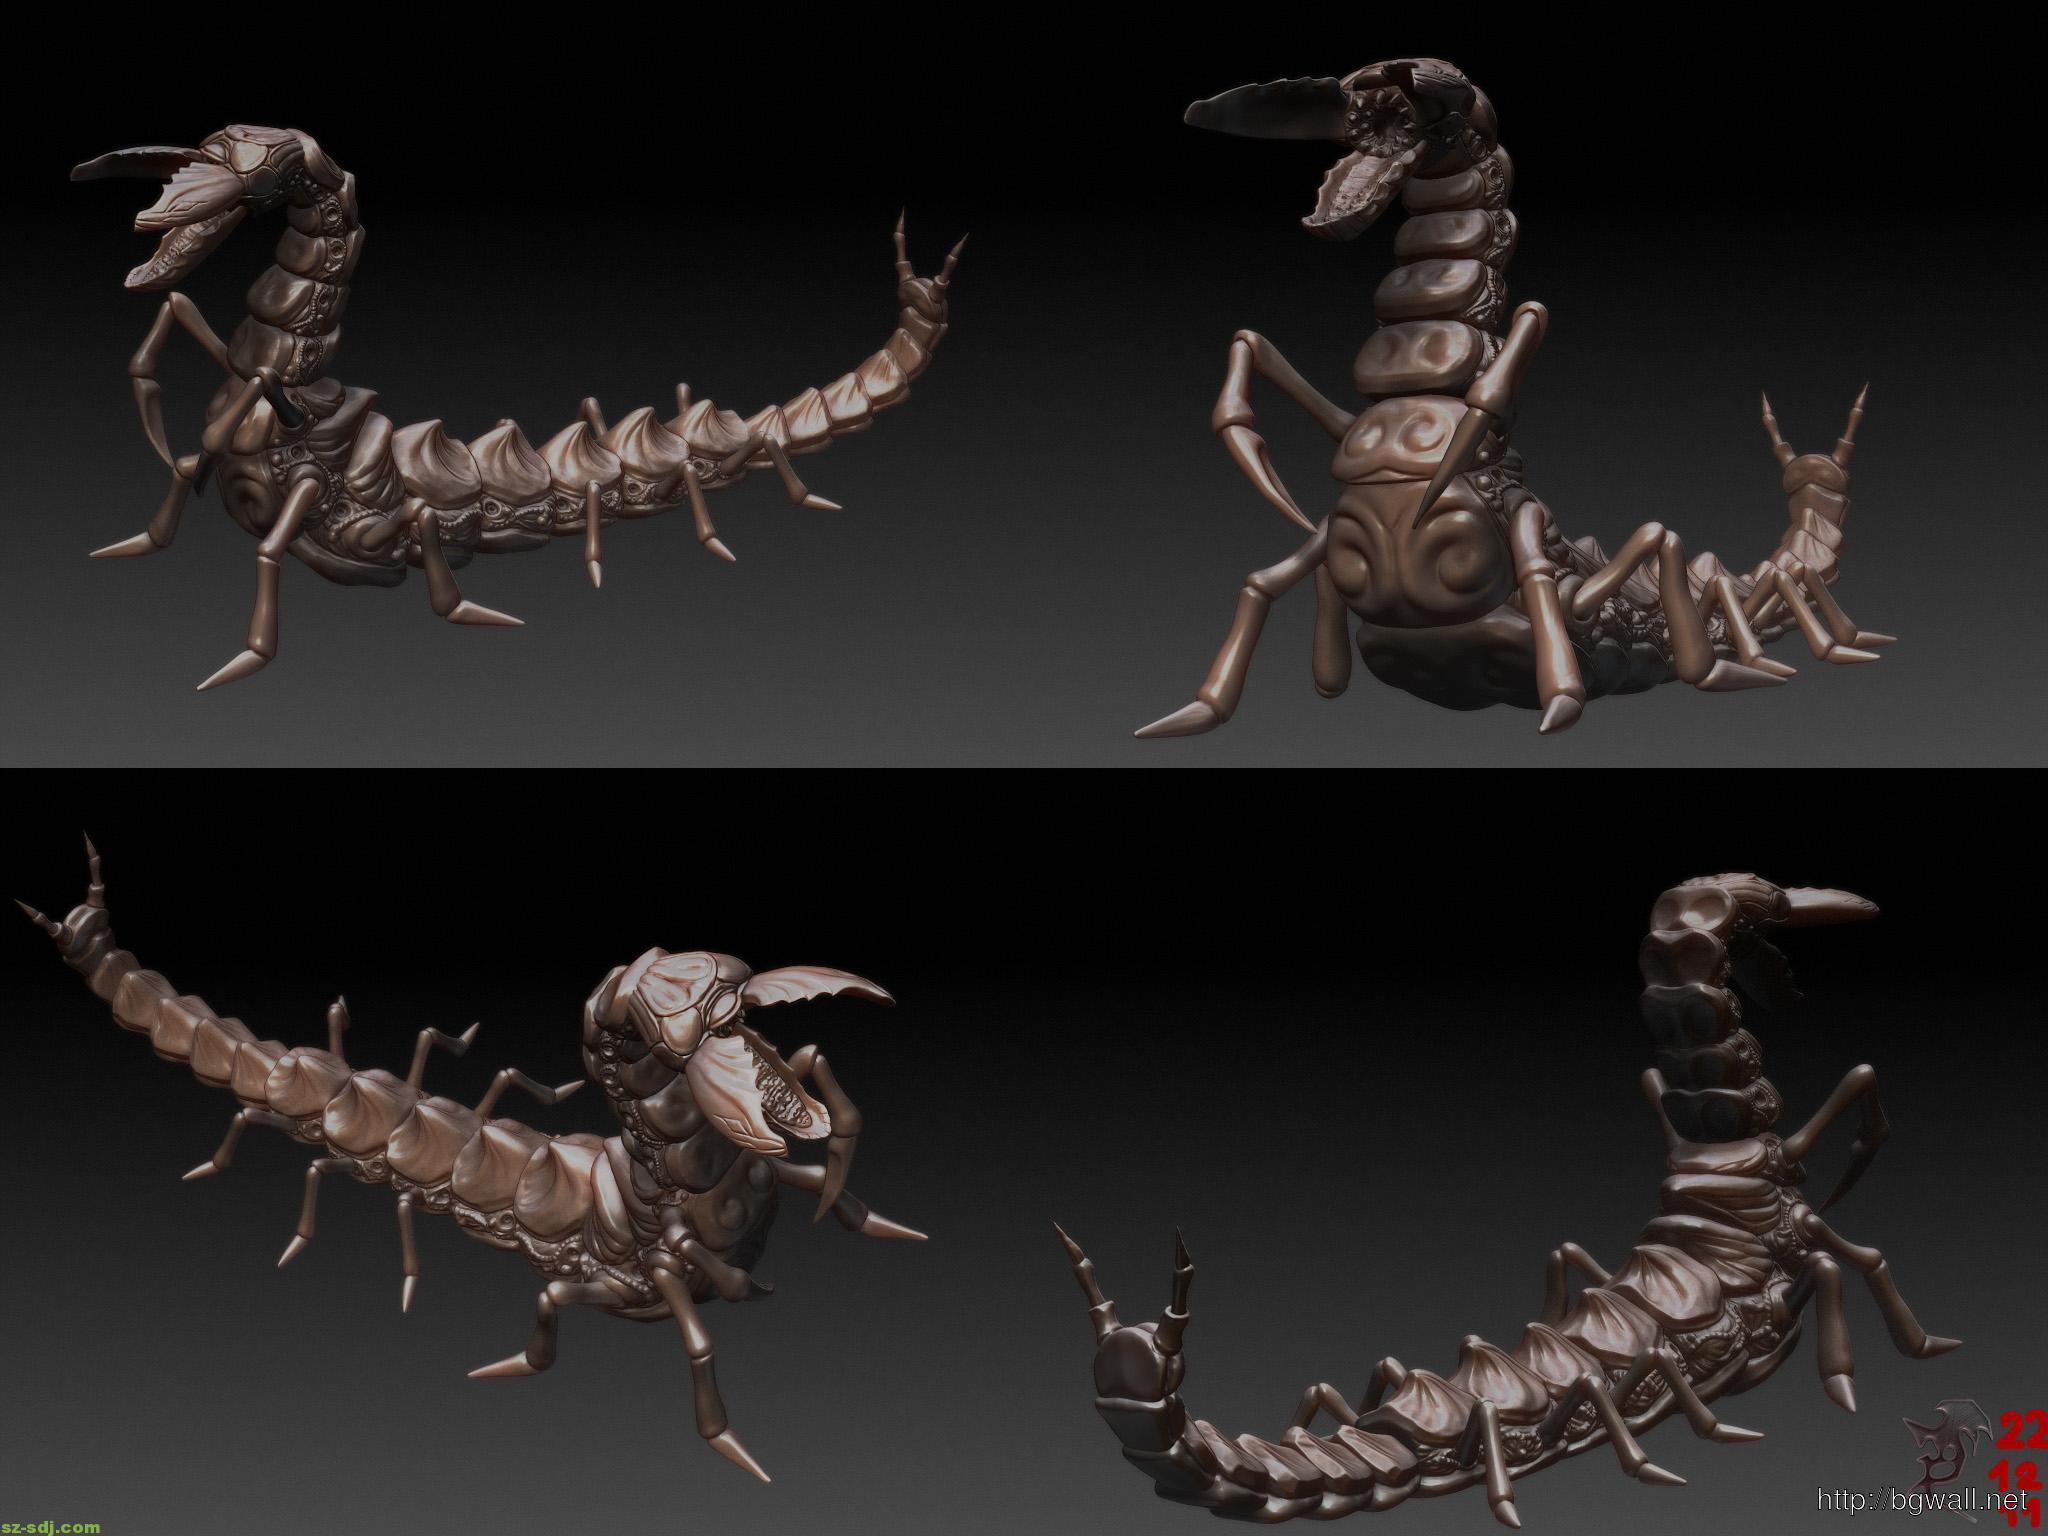 3d Dragon Centipede Artwork Wallpaper – Background ...